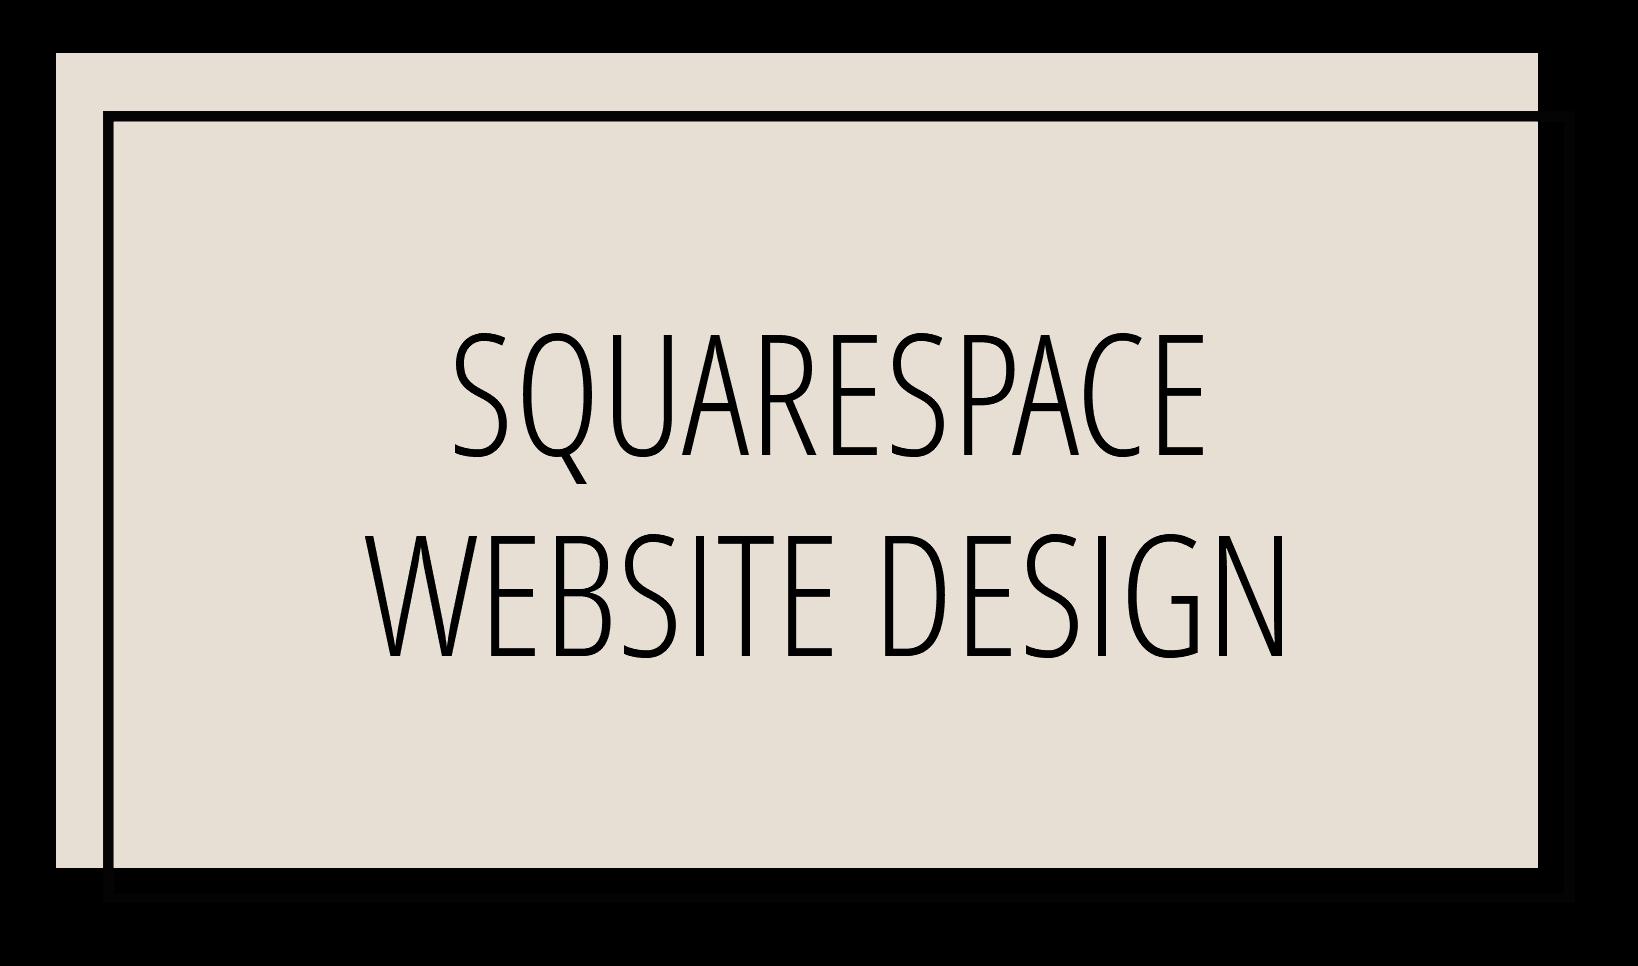 Squarespace Website Design Andrea K Chapman